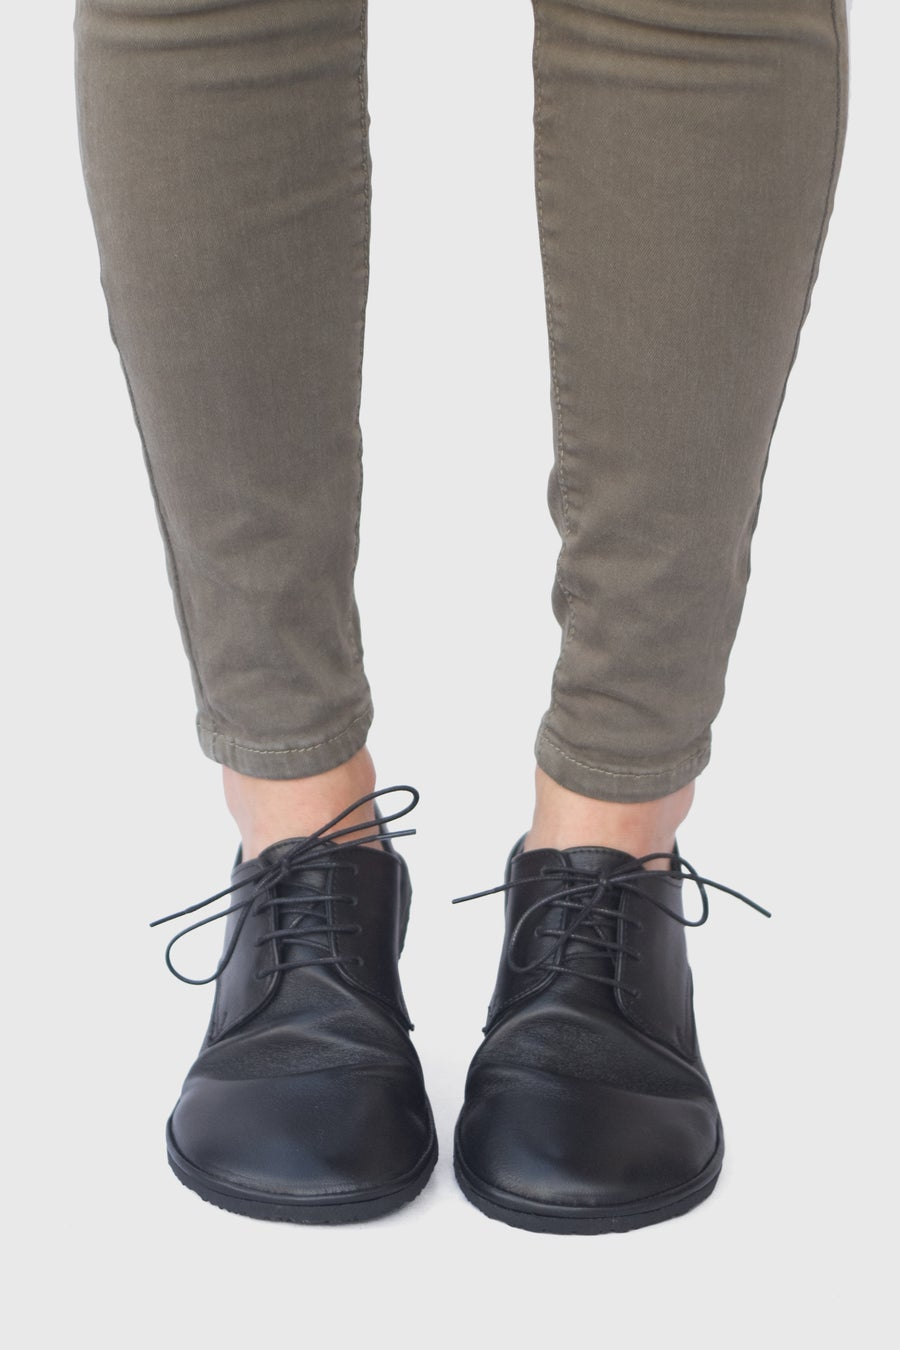 Image of Plain Toe Derby in Matte Black